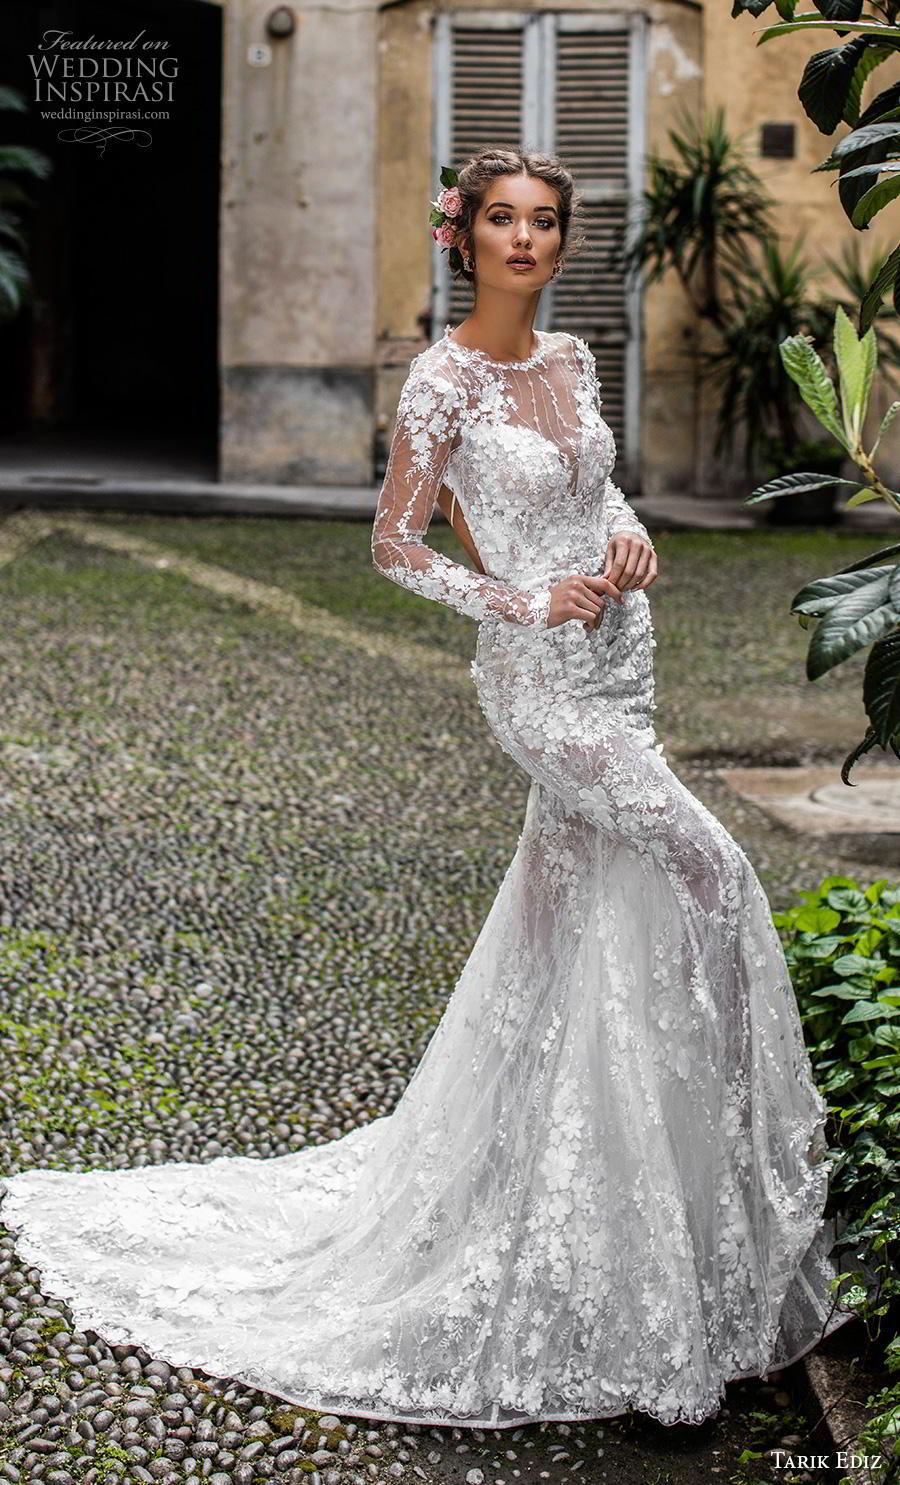 tarik ediz 2019 bridal long sleeves illusion jewel sweetheart neckline full embellishment elegant fit and flare wedding dress low keyhole back chapel train (15) mv